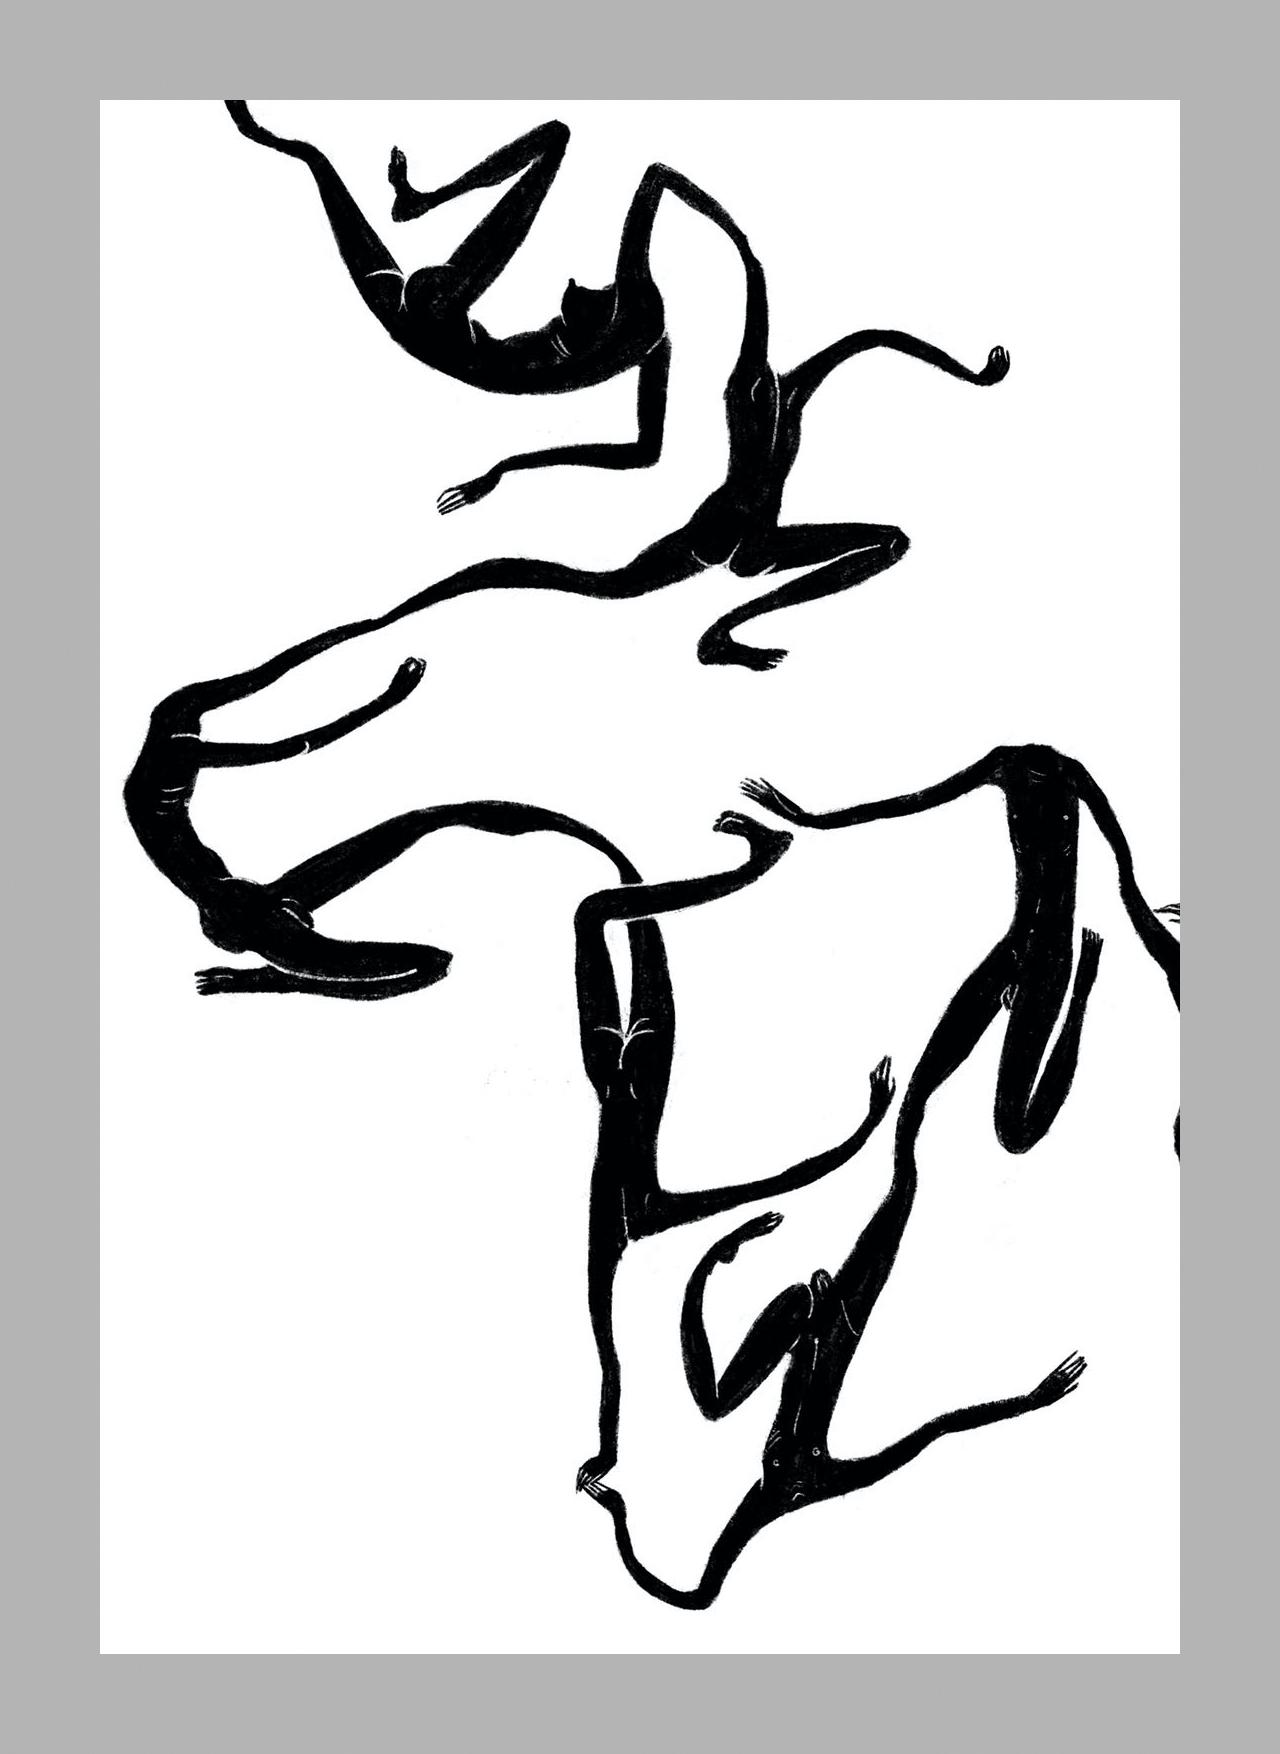 Zhou Meng, series work of Imaginitive Figures (detail)